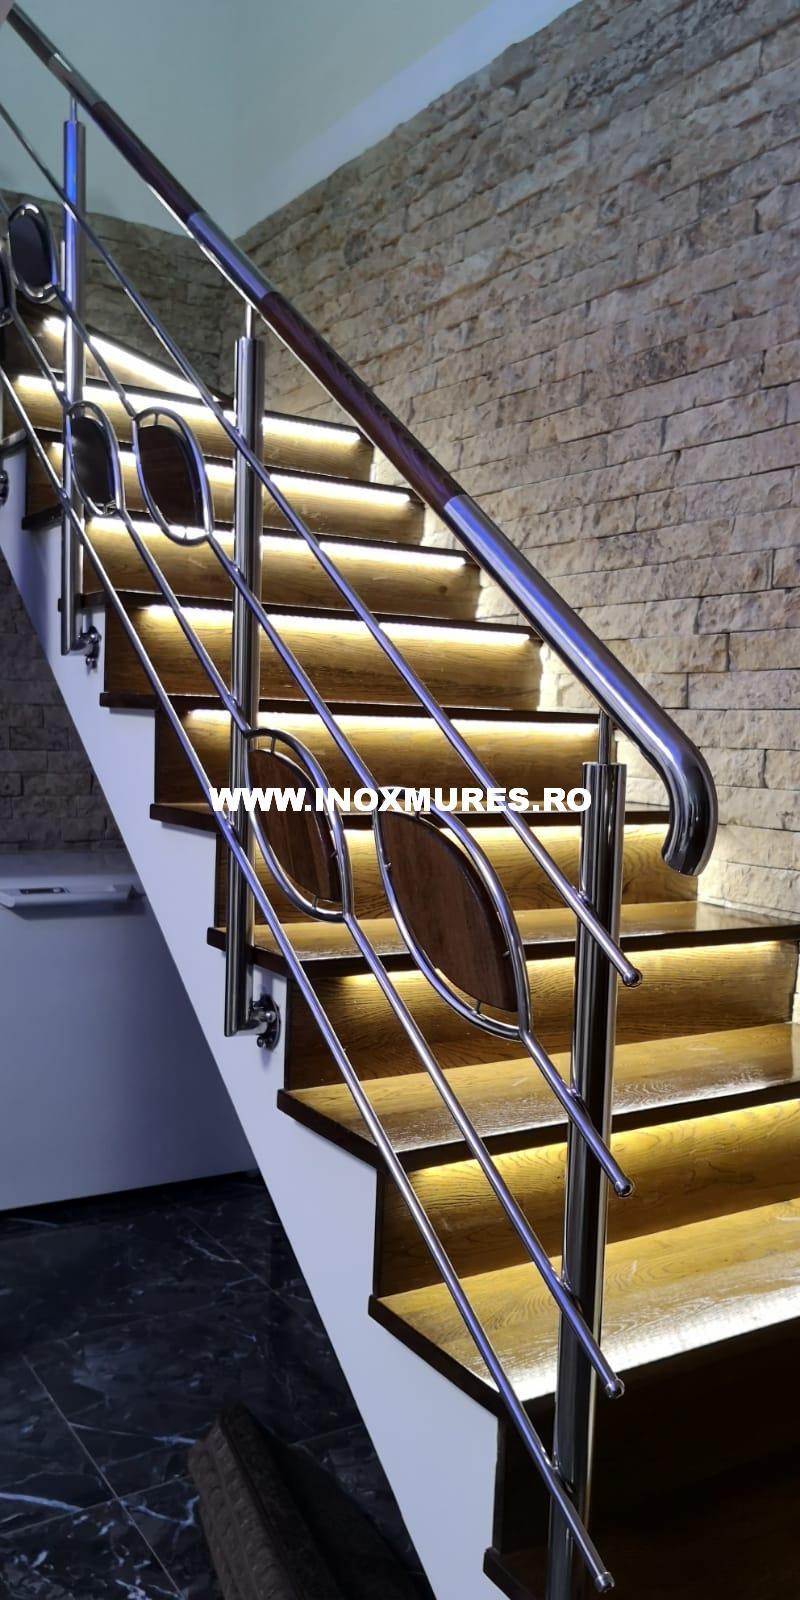 Balustrada de inox combinata cu lemn Tarnaveni 12.12.2019